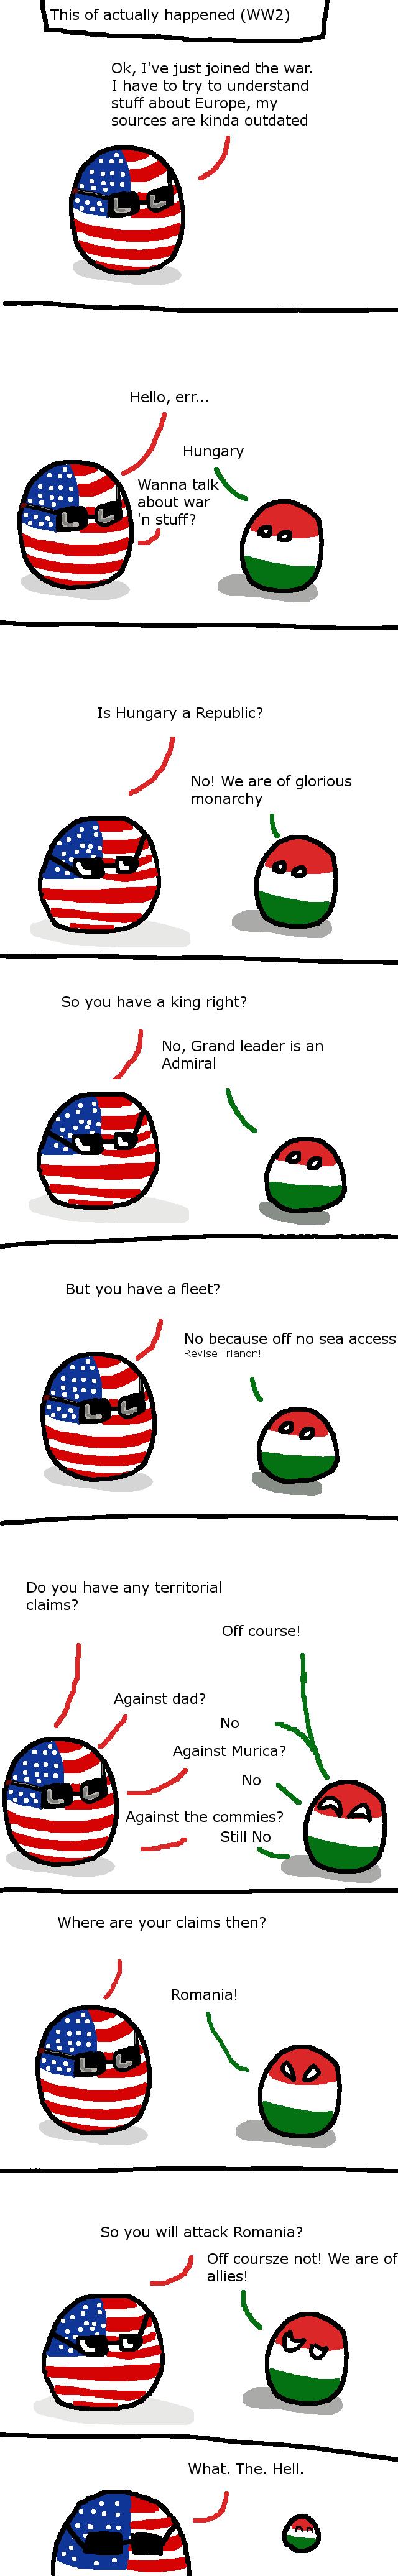 European politics 101